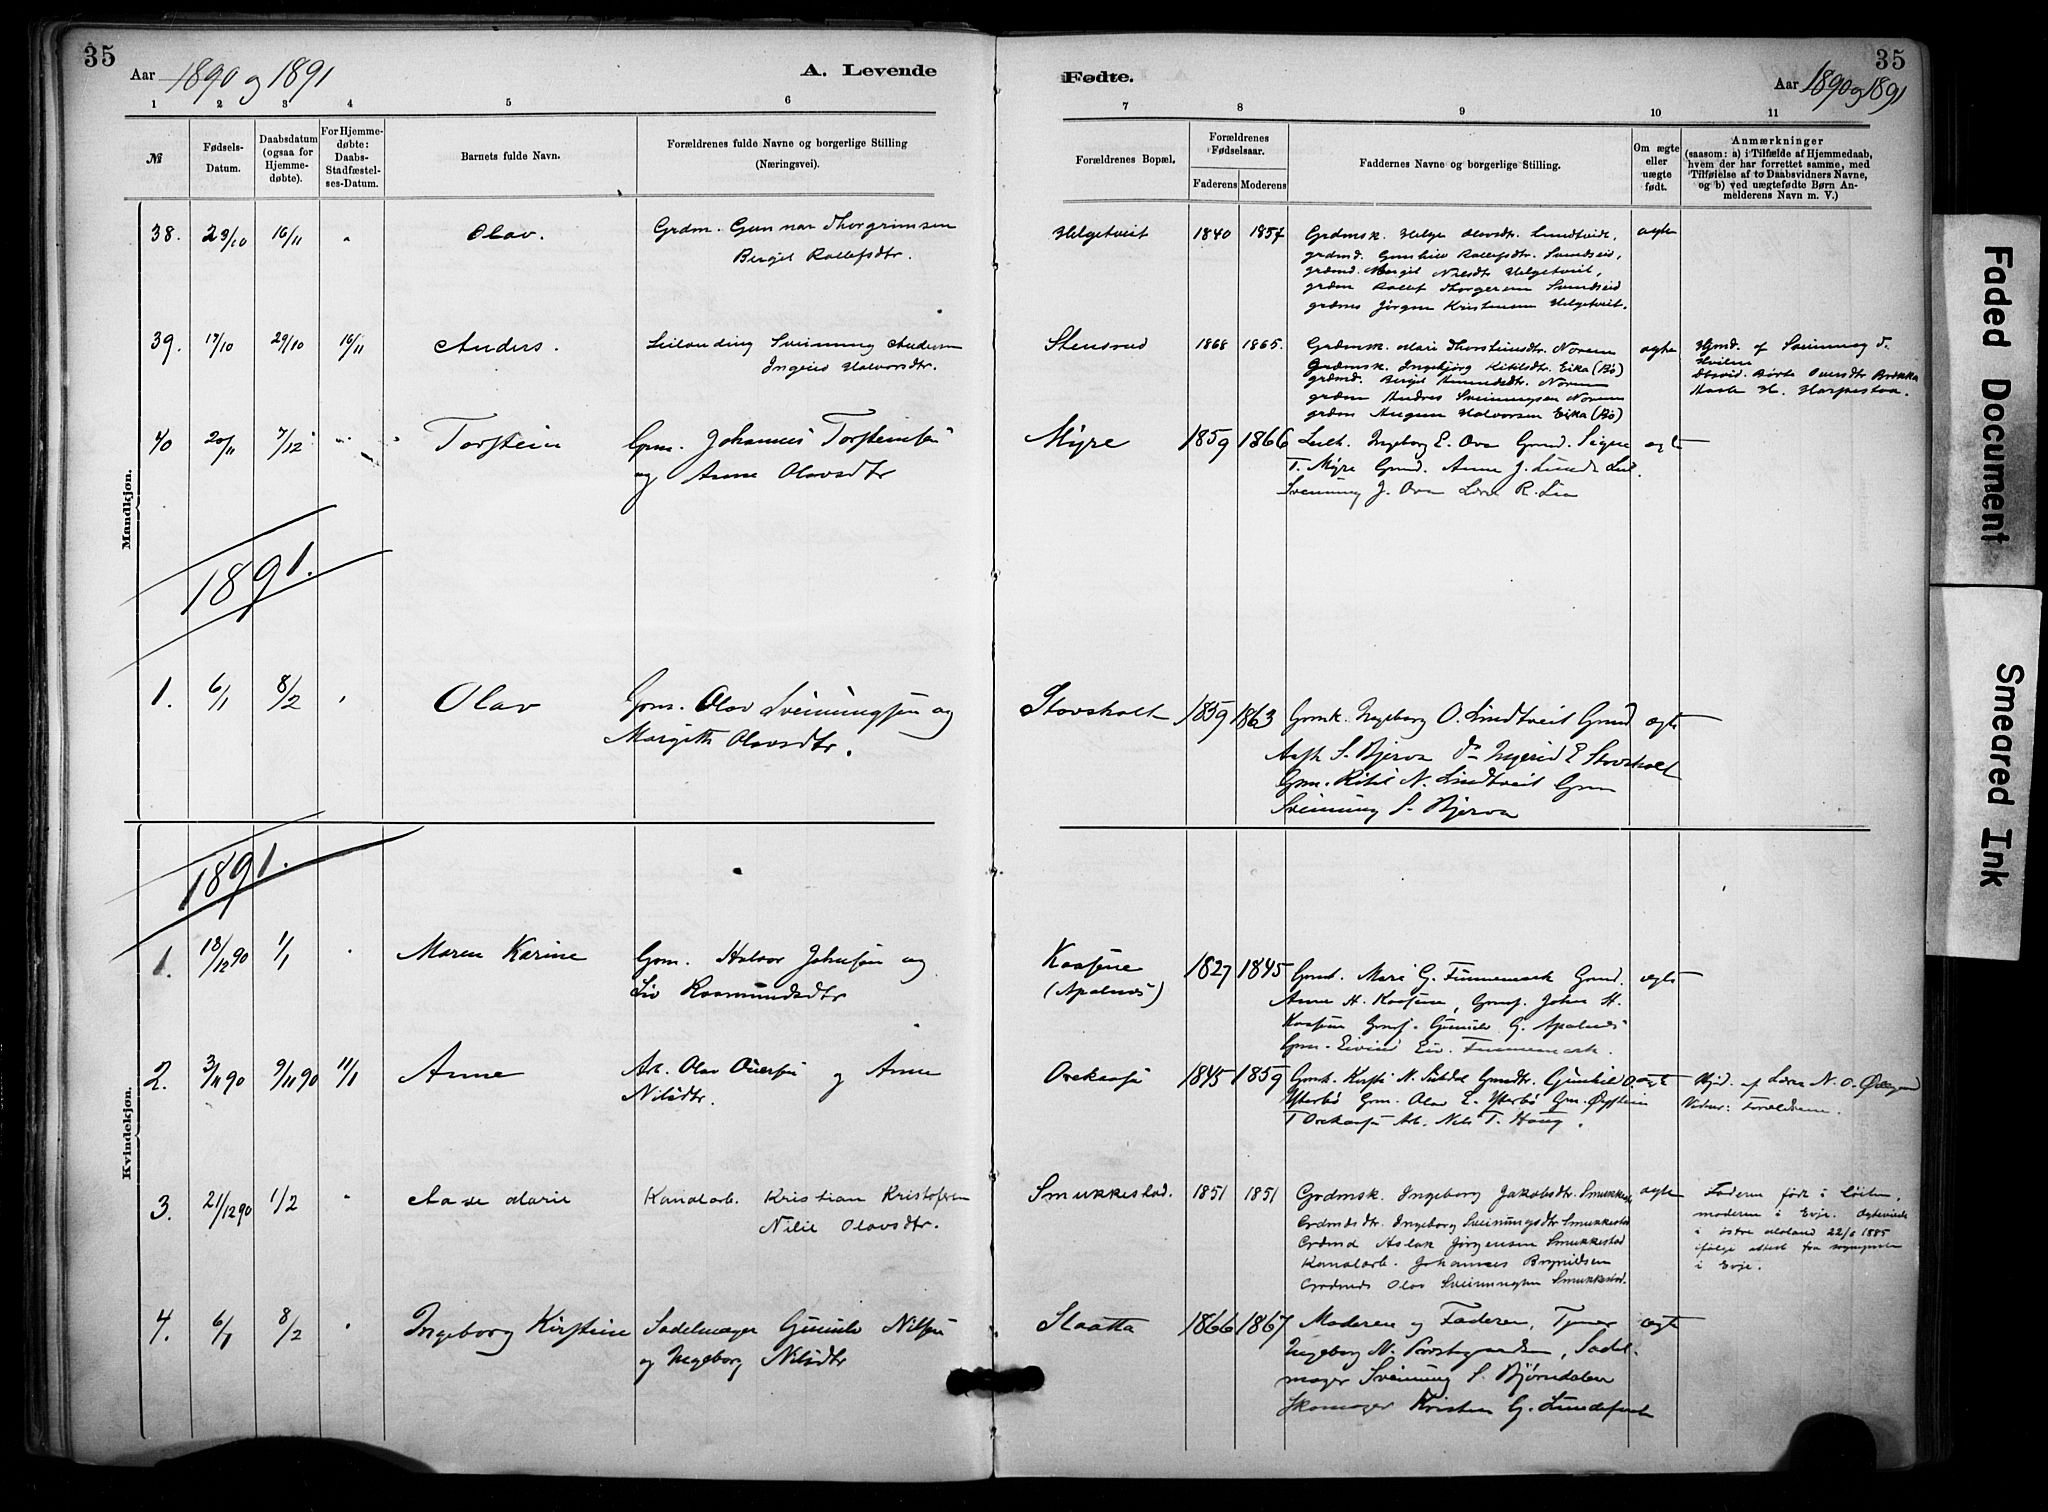 SAKO, Lunde kirkebøker, F/Fa/L0002: Ministerialbok nr. I 2, 1884-1892, s. 35